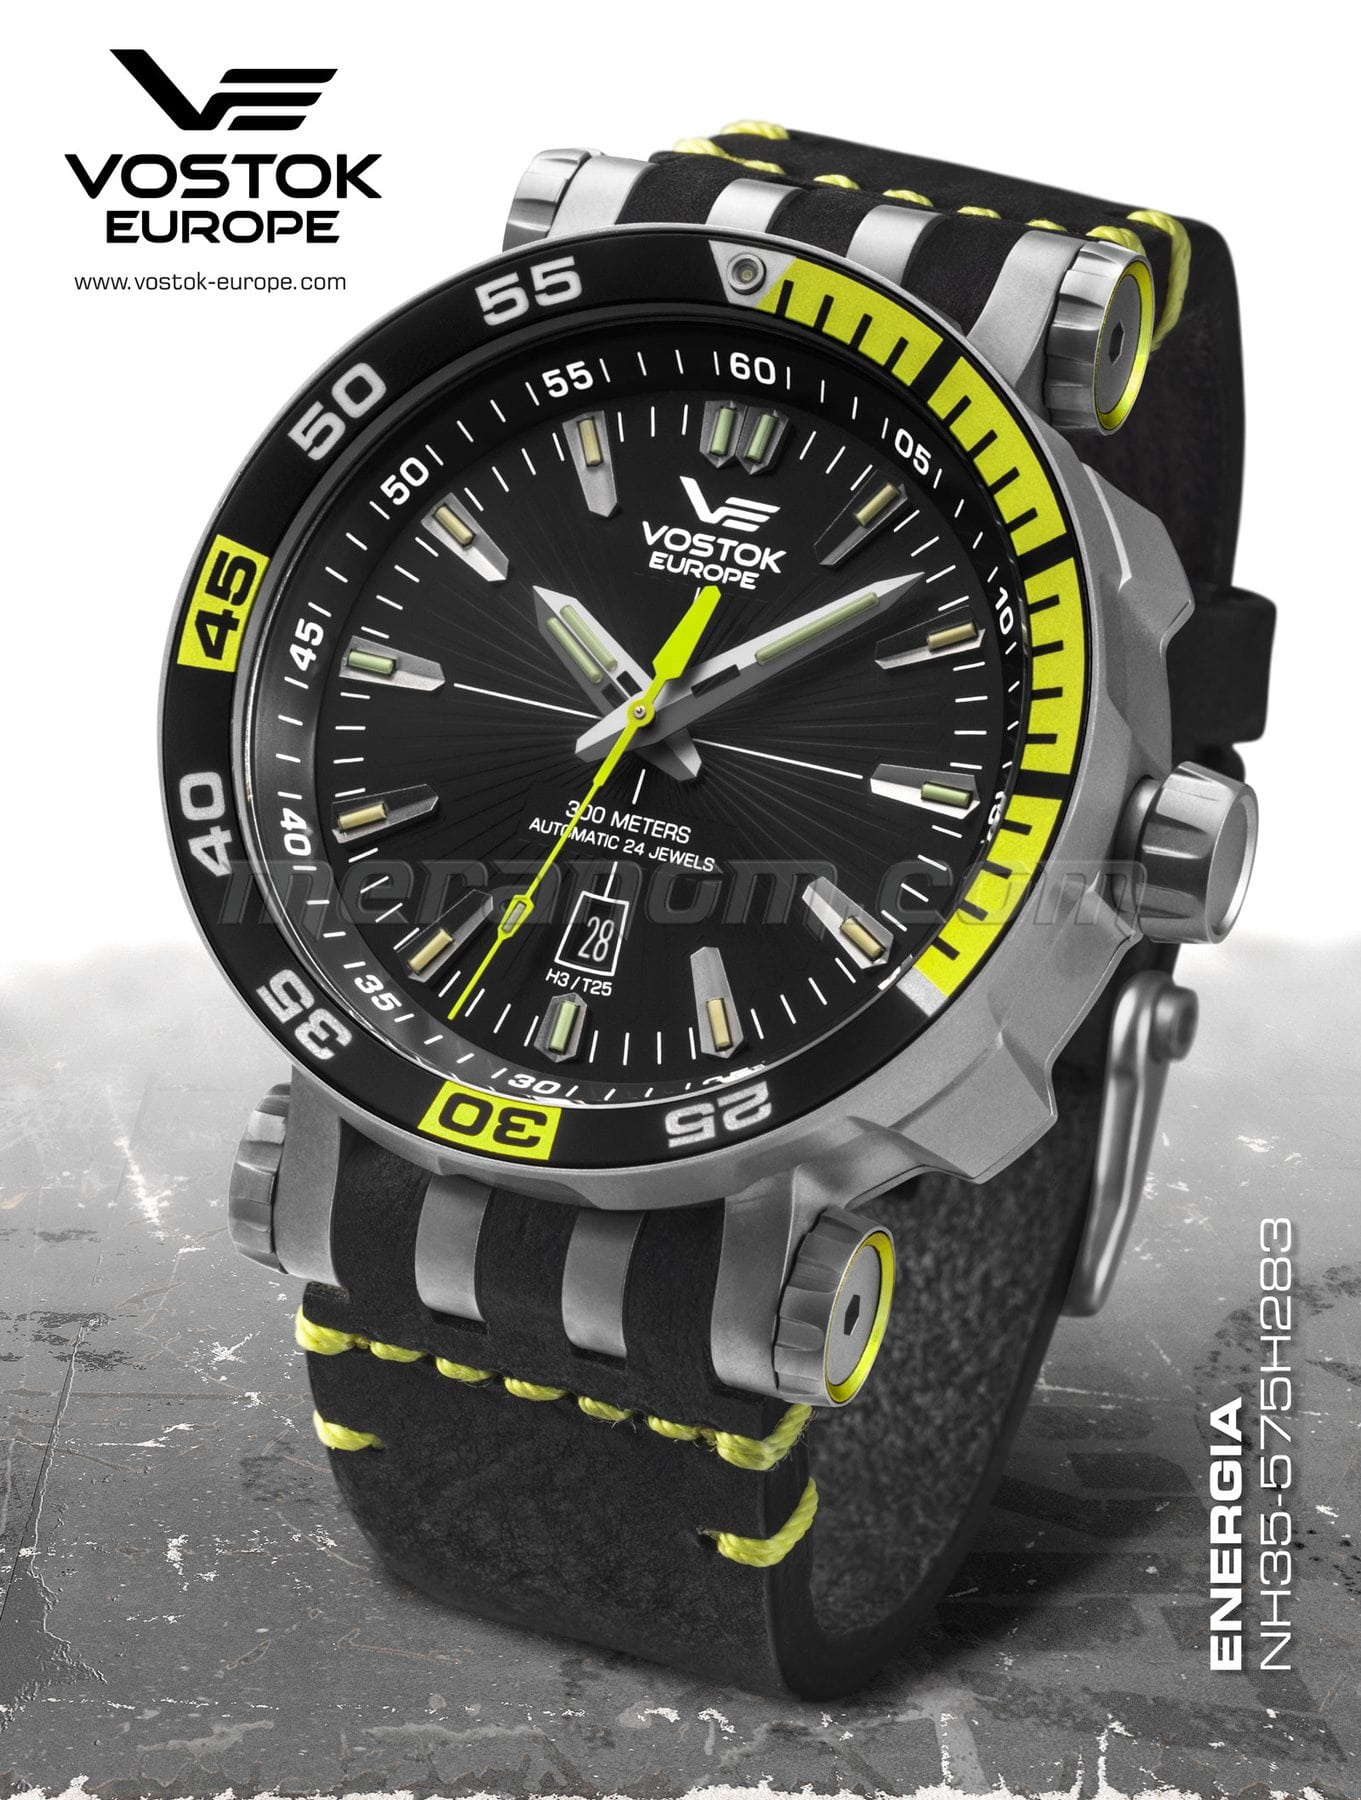 a566bc27b509 Vostok Europe relojes Vostok Europe Energia NH35A 575H283 compra a ...